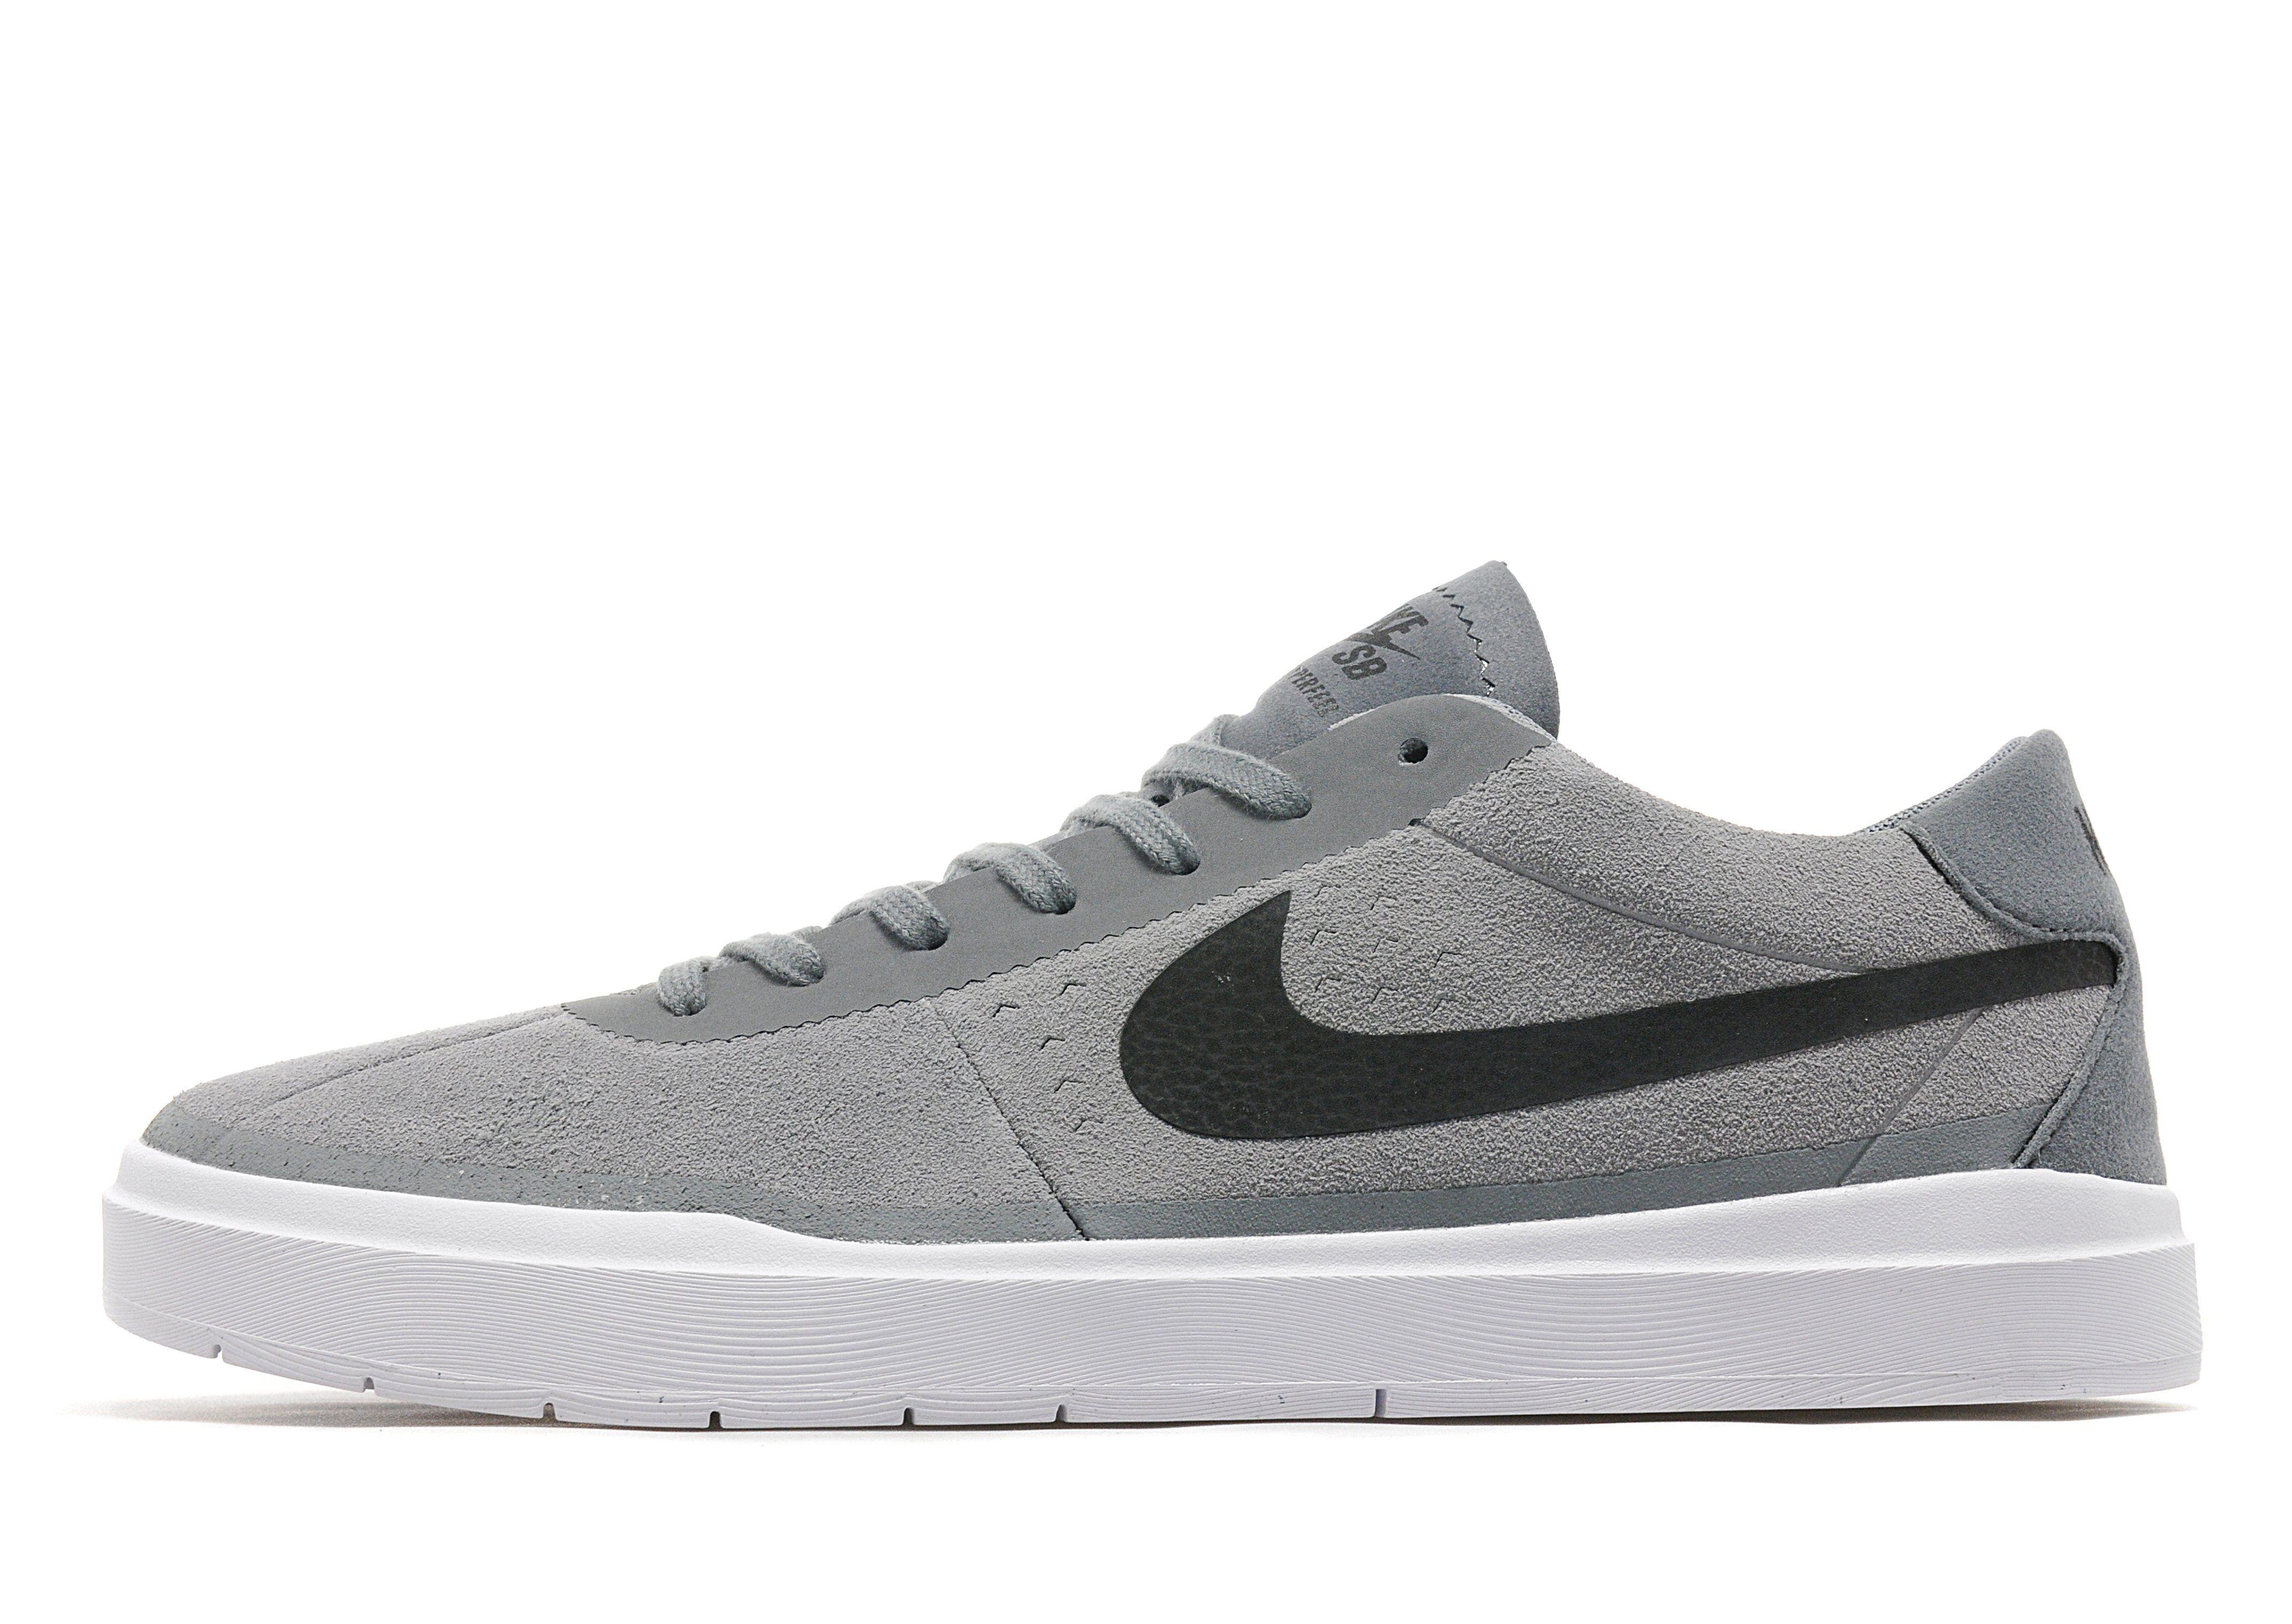 best service a4a51 dbdc7 good Nike SB Bruin Hyperfeel | JD Sports - s132716079.onlinehome.us